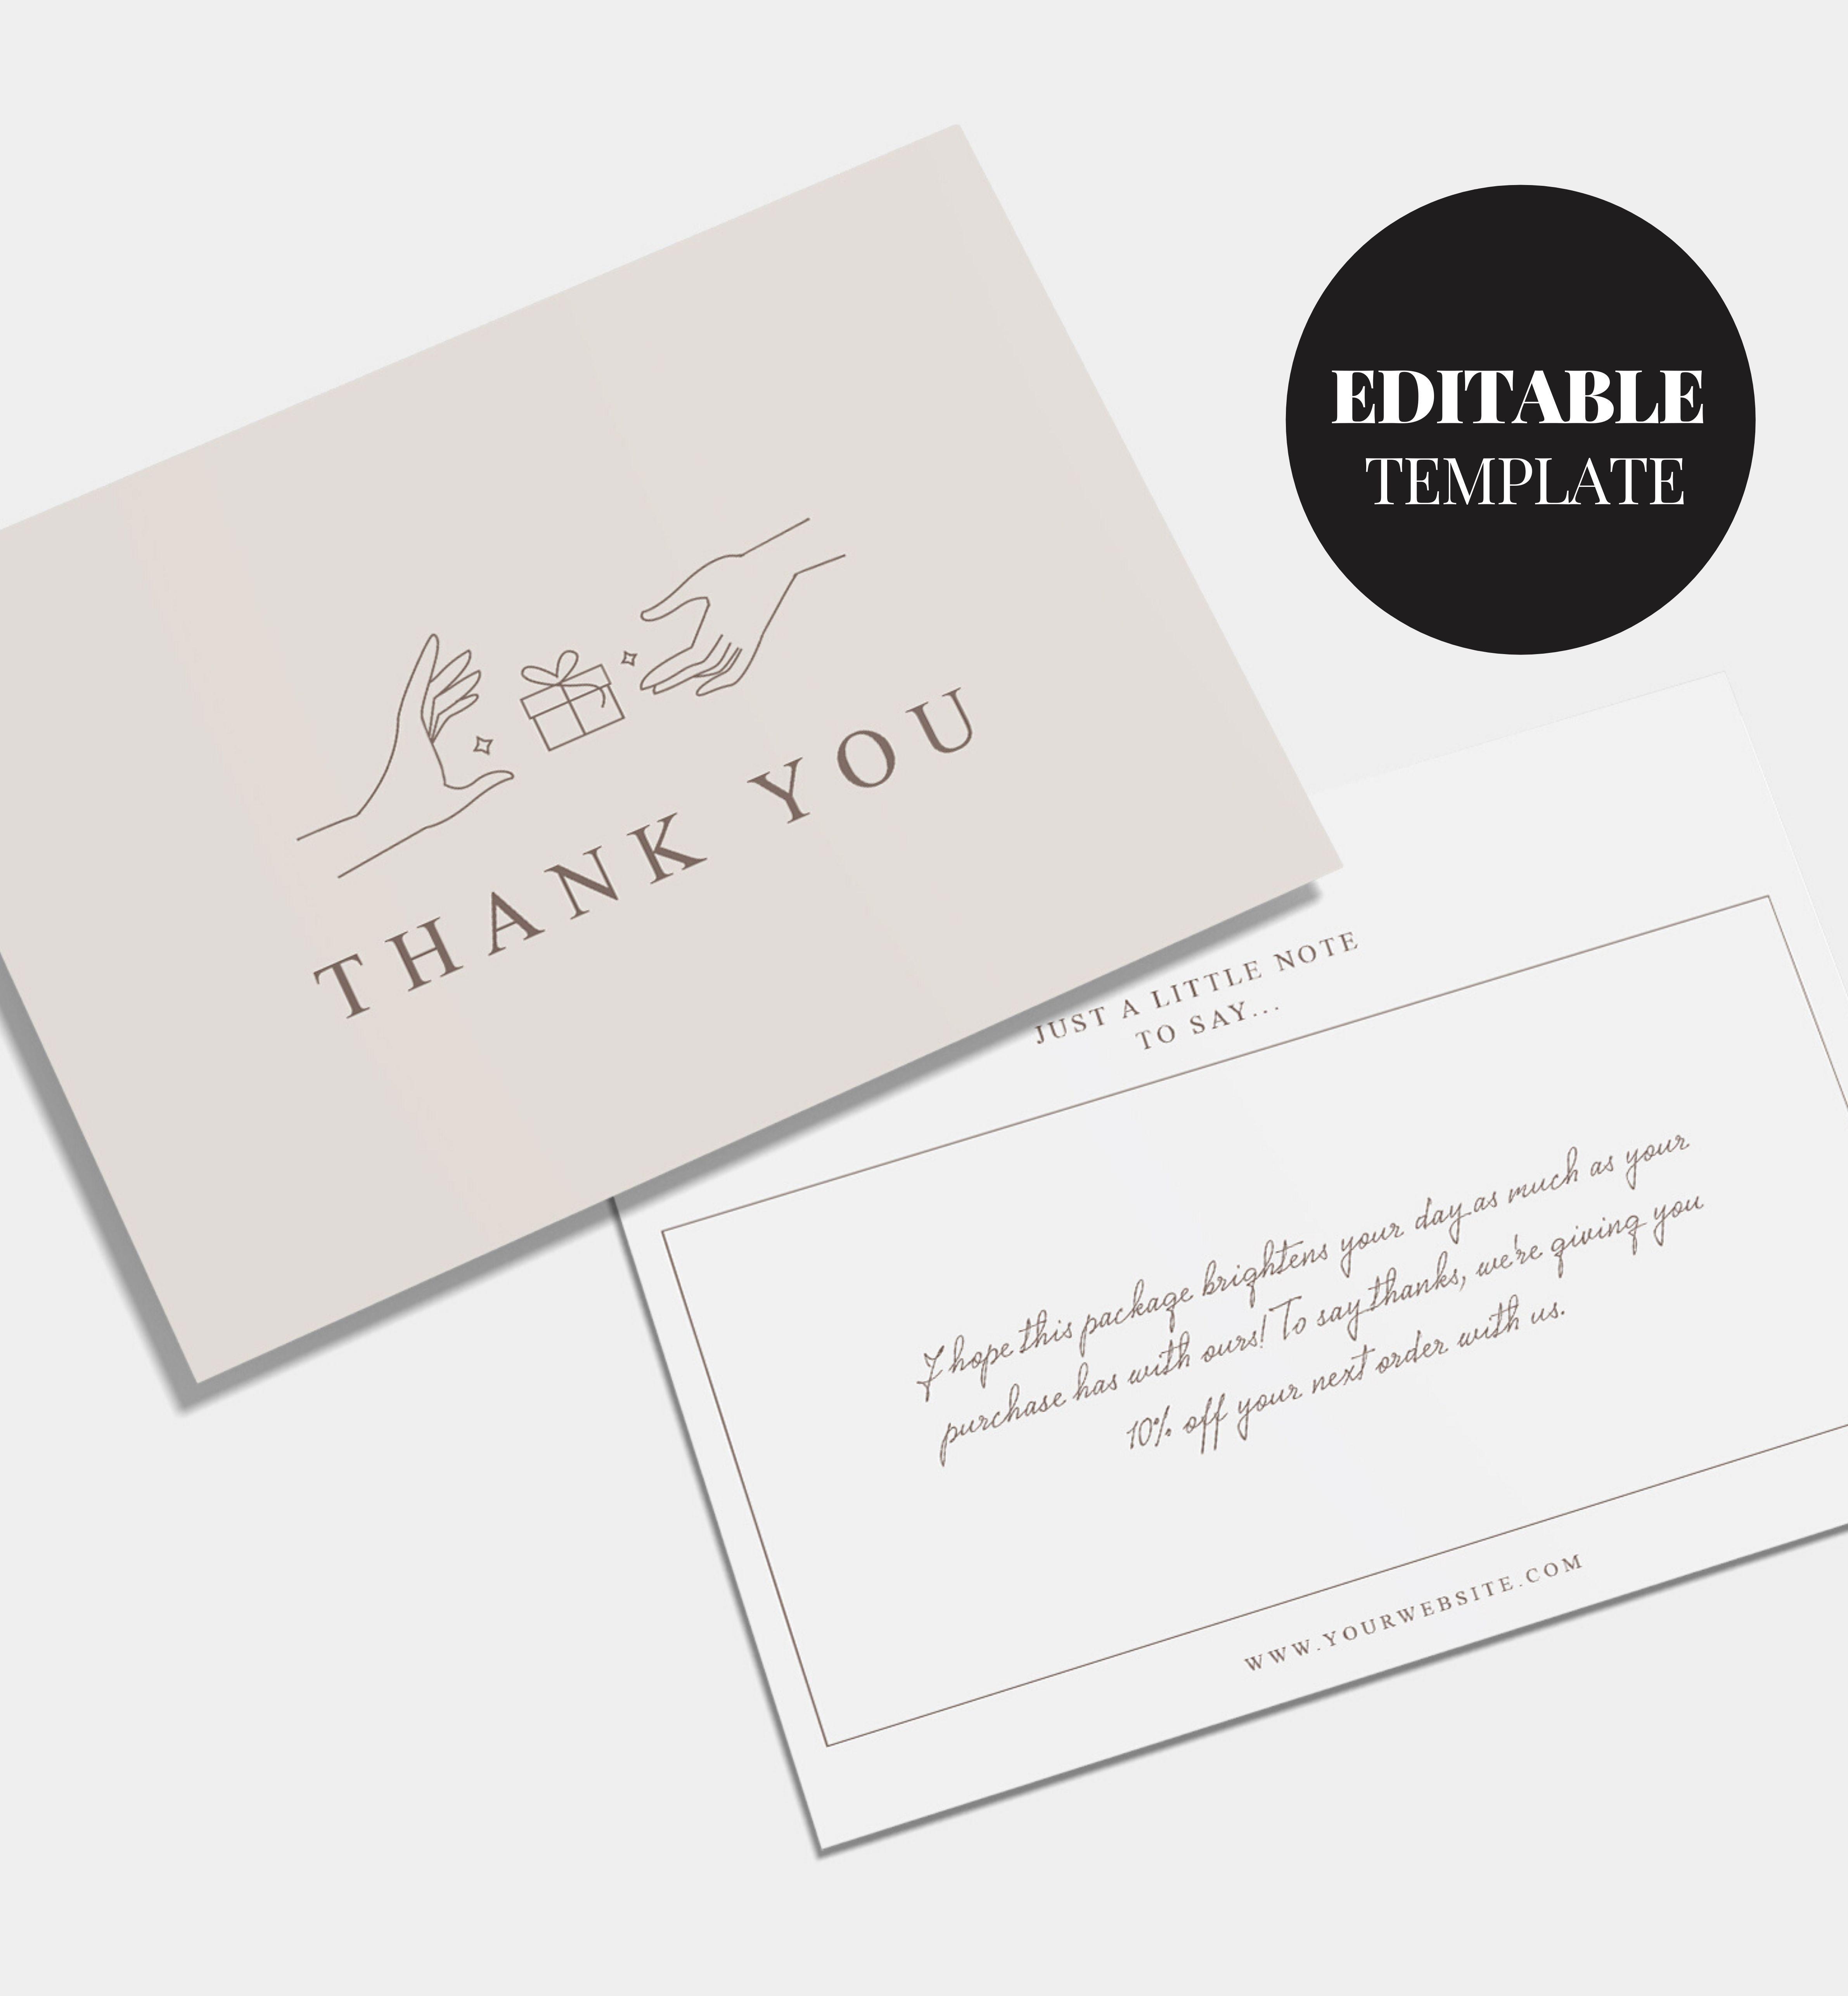 Editable Business Thank You Card Printable Thank You For Your Order Customer Thank You Kartu Nama Bisnis Kartu Nama Ide Kemasan